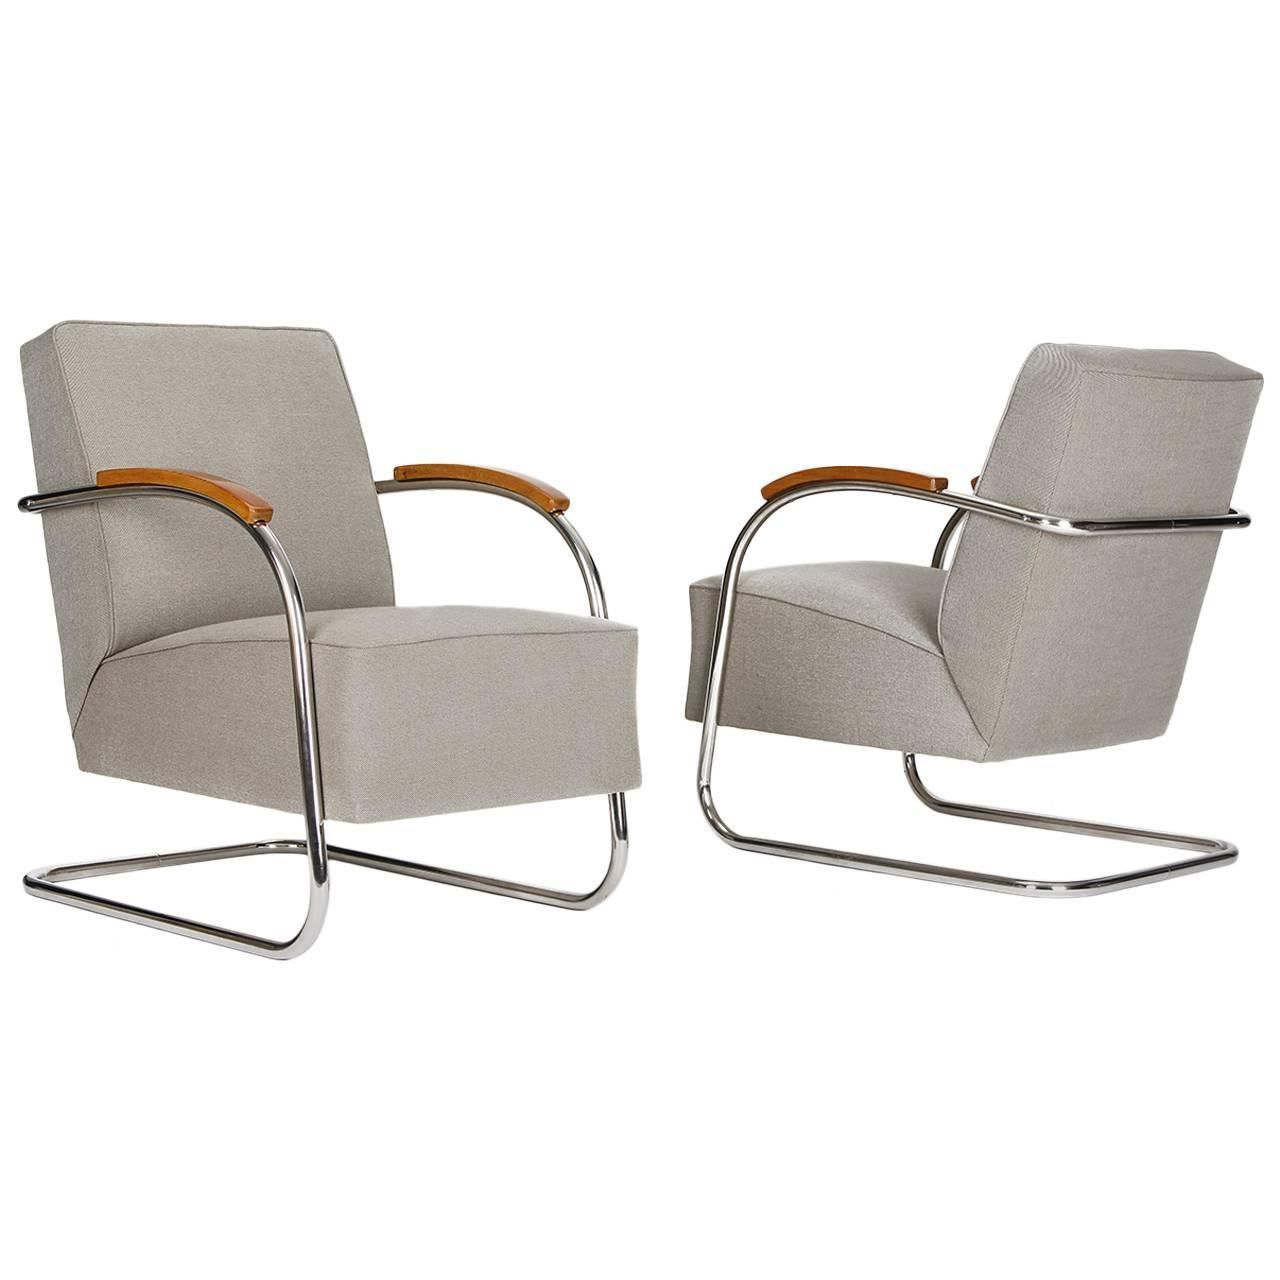 Pair of cantilever tubular steel chairs czech bauhaus by m cke melder 1930s